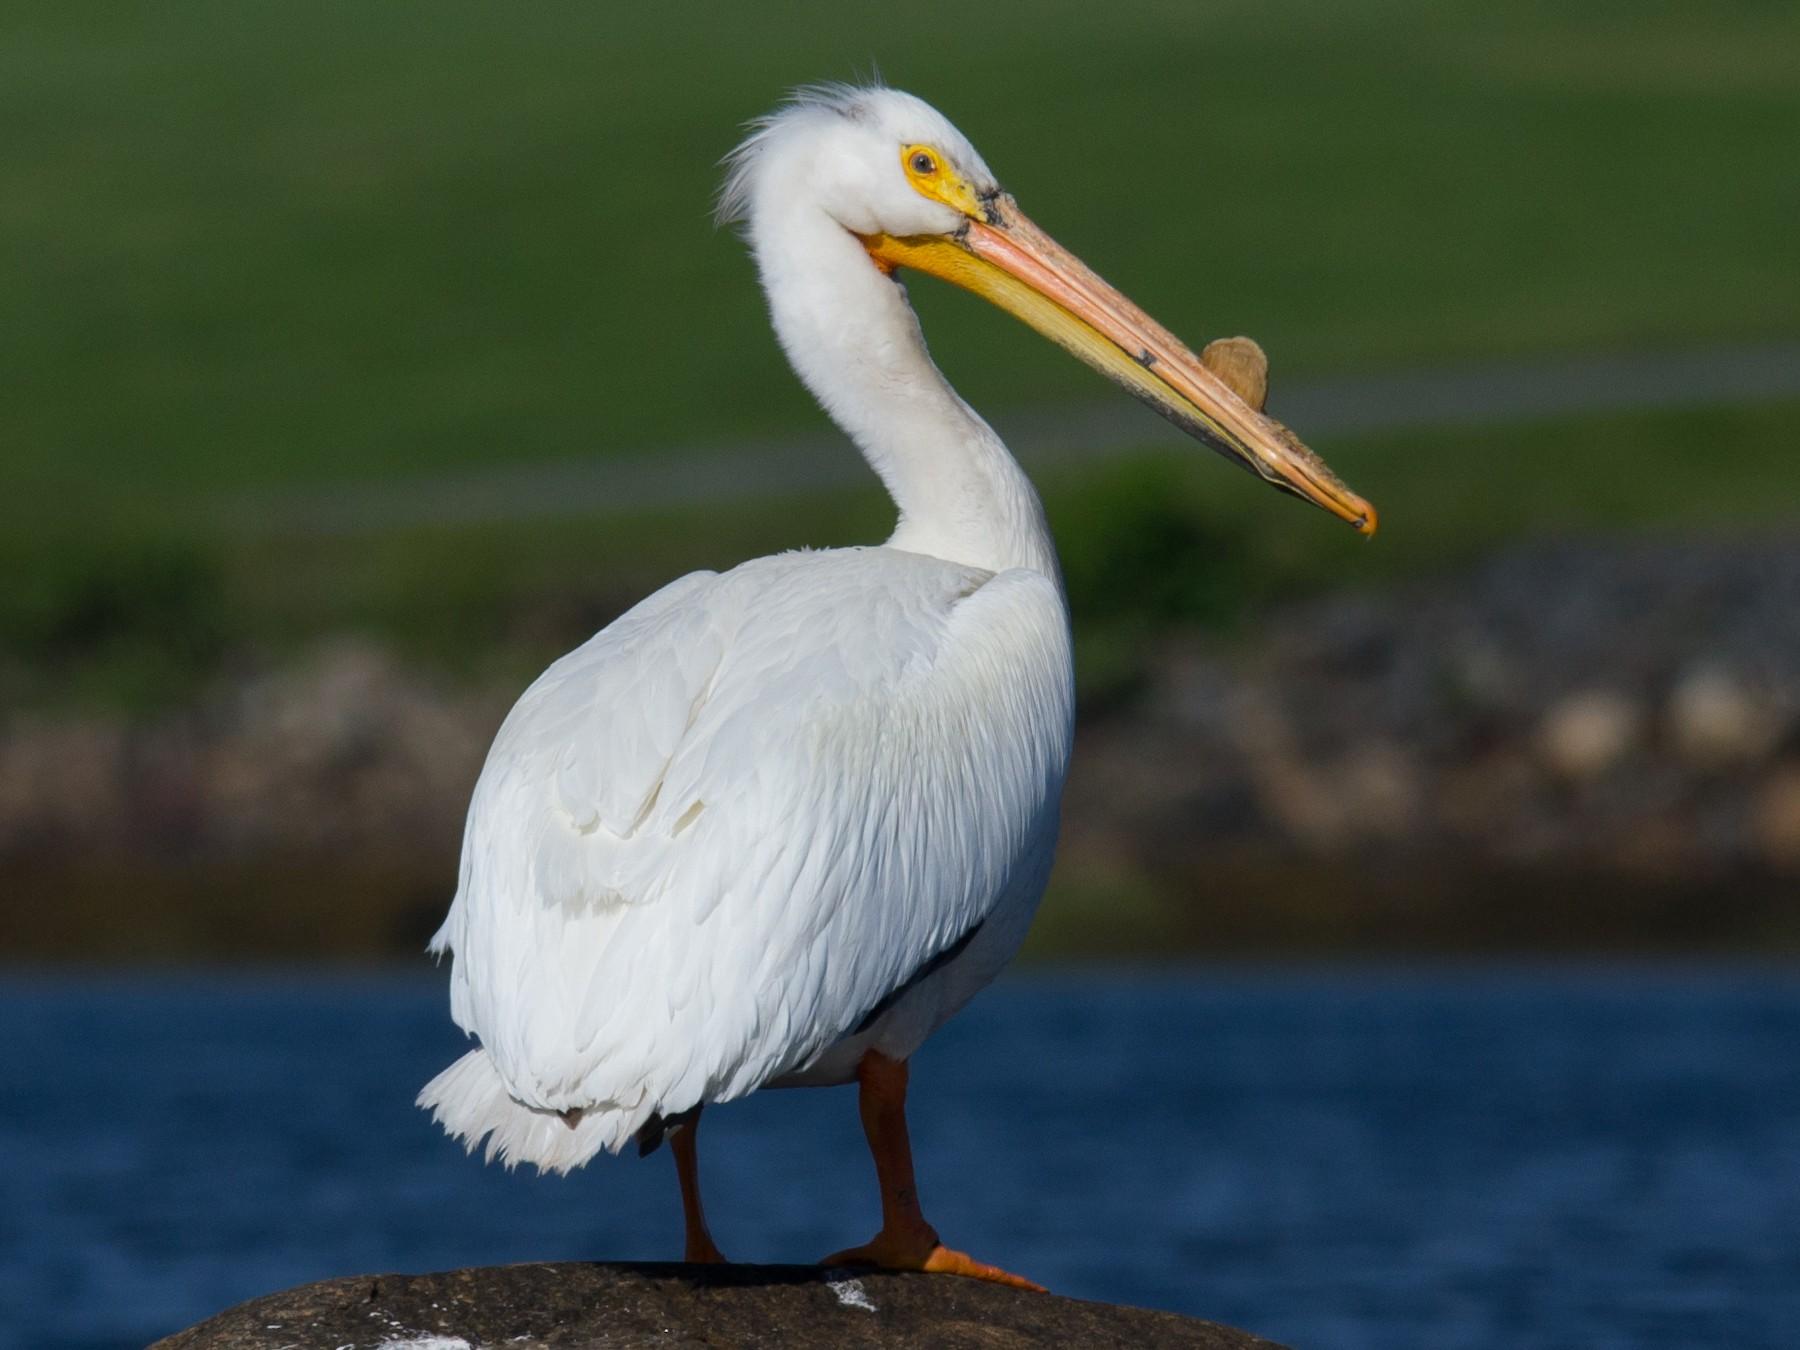 American White Pelican - Alix d'Entremont